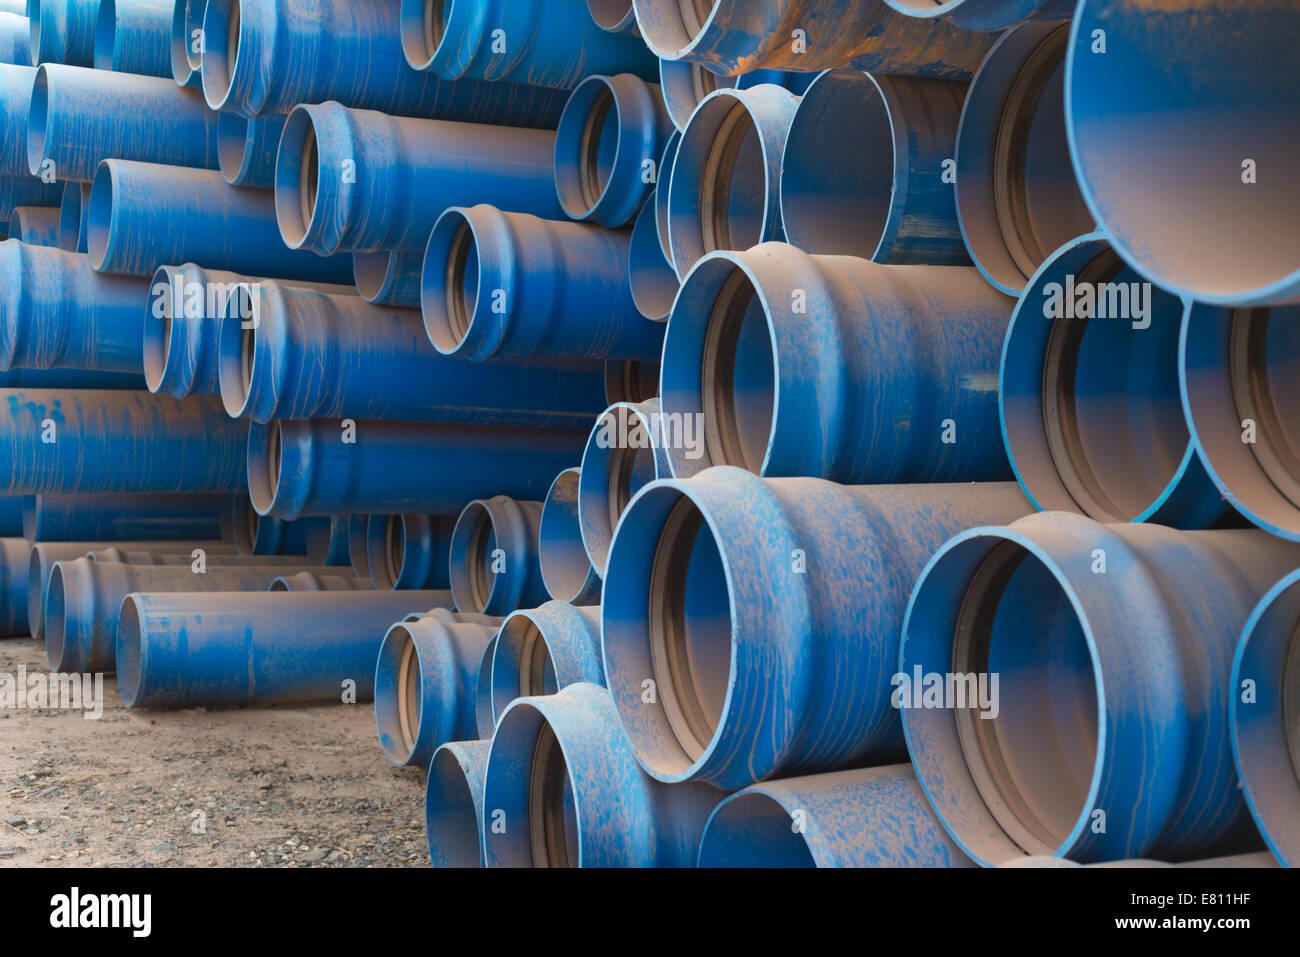 Fabulous Kunststoffrohre Stockfotos & Kunststoffrohre Bilder - Alamy JT27